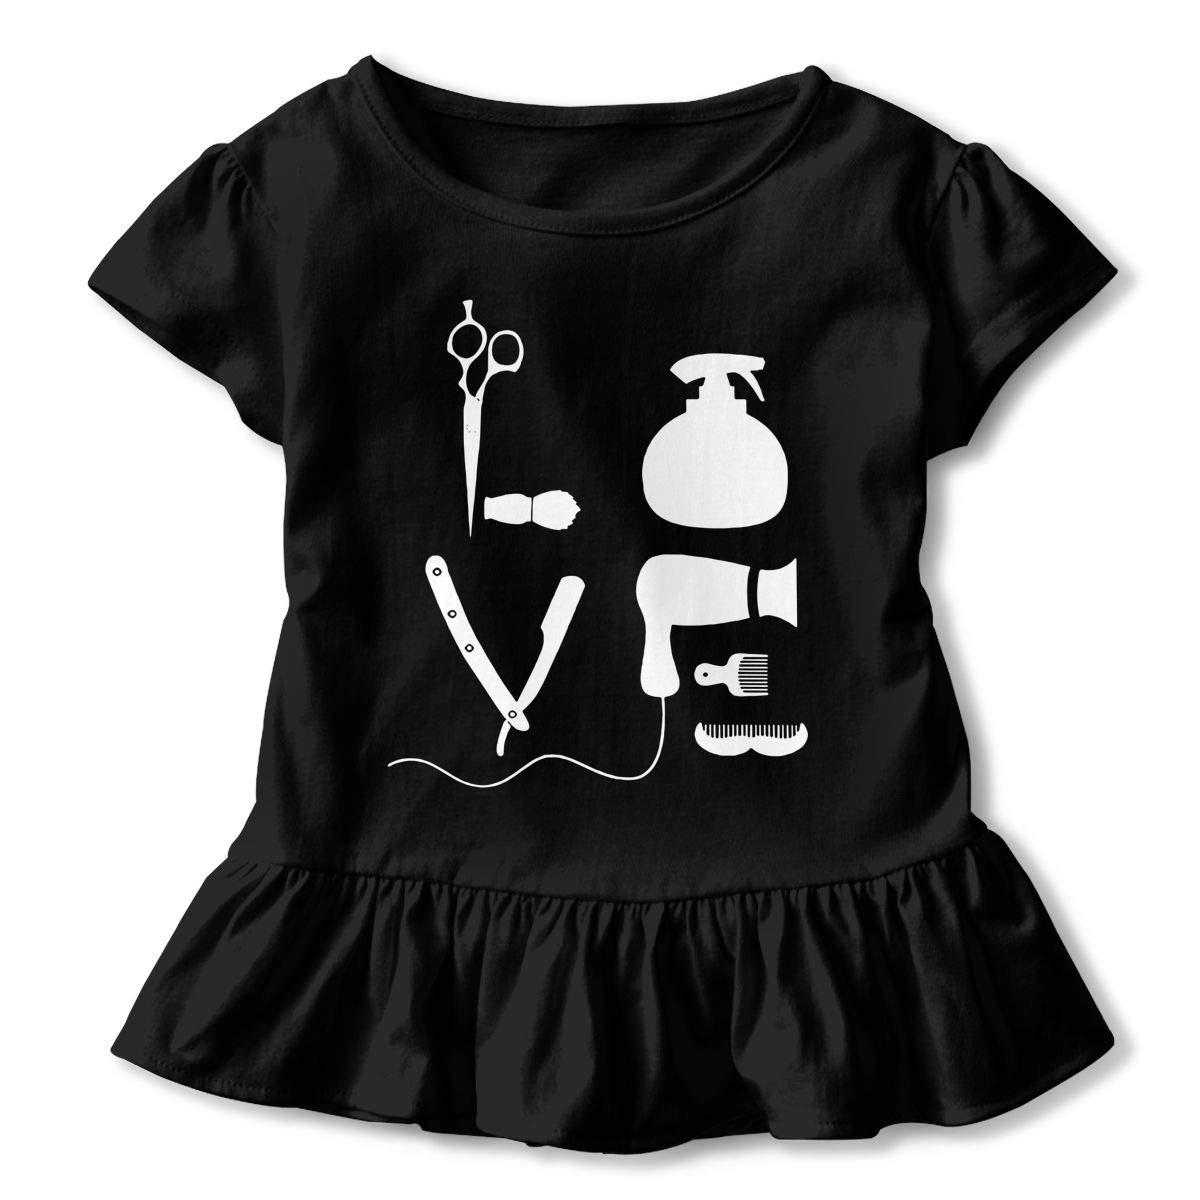 Barber Salon Hairdresser Love Childrens Girls Short Sleeve T Shirts Ruffles Shirt T-Shirt for 2-6T